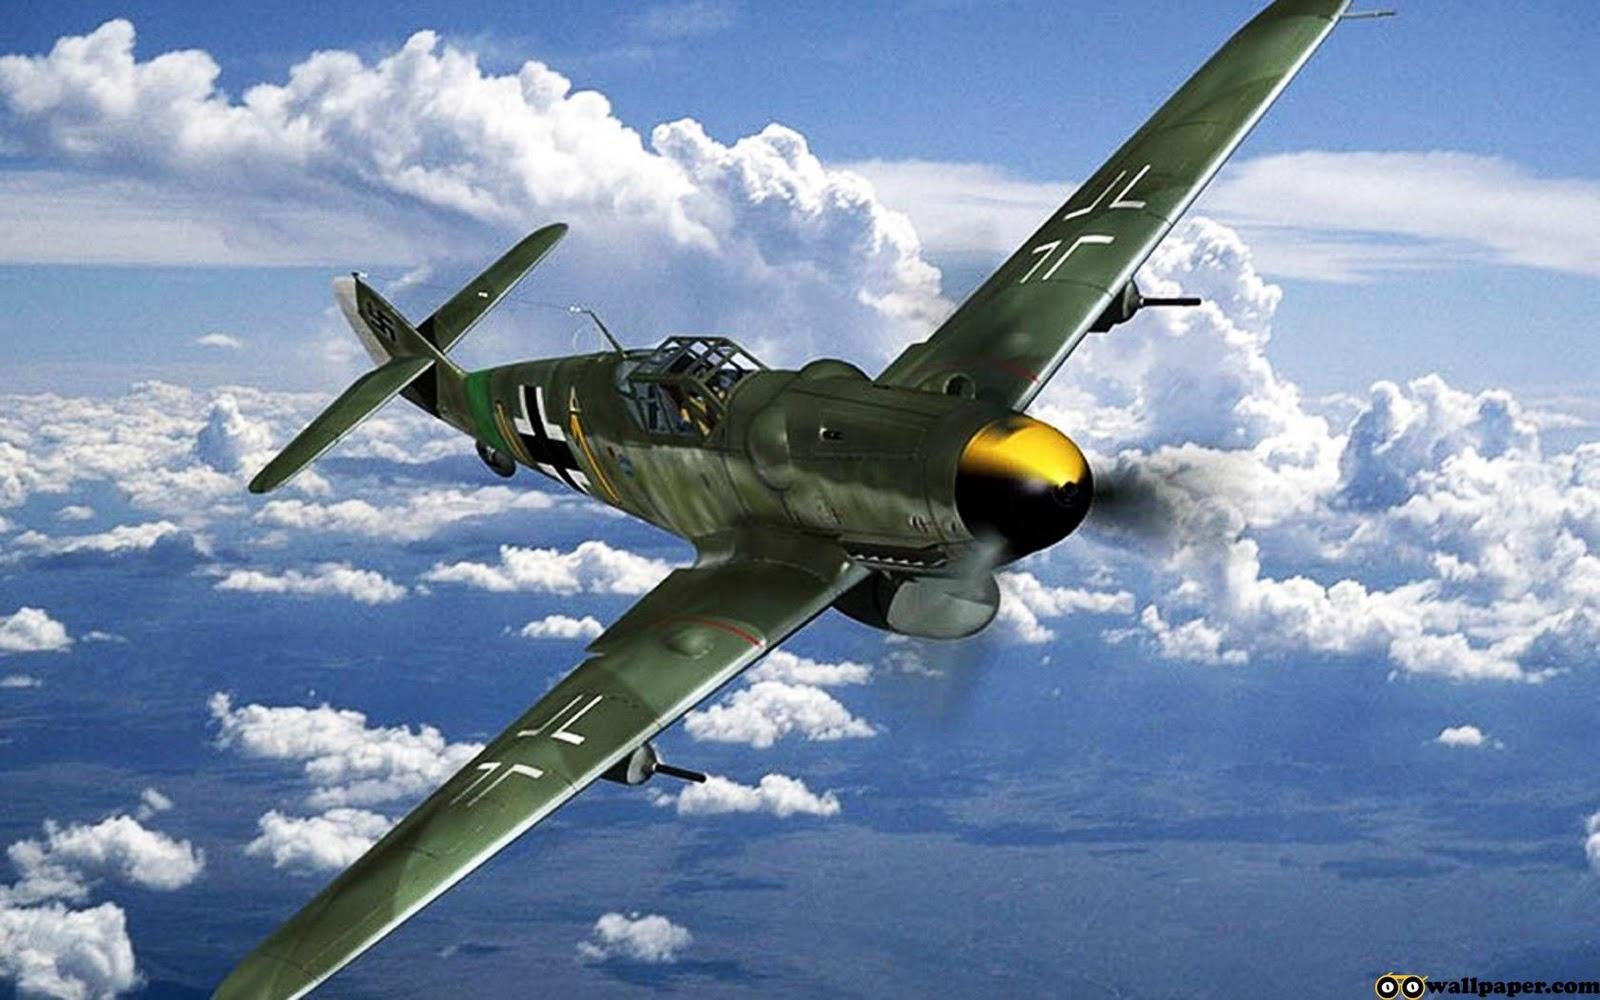 http://1.bp.blogspot.com/-nBHYkiyqPpA/TxWSTJ-MOVI/AAAAAAAAC_E/JsJB24yzOs4/s1600/oo_world_war_016.jpg